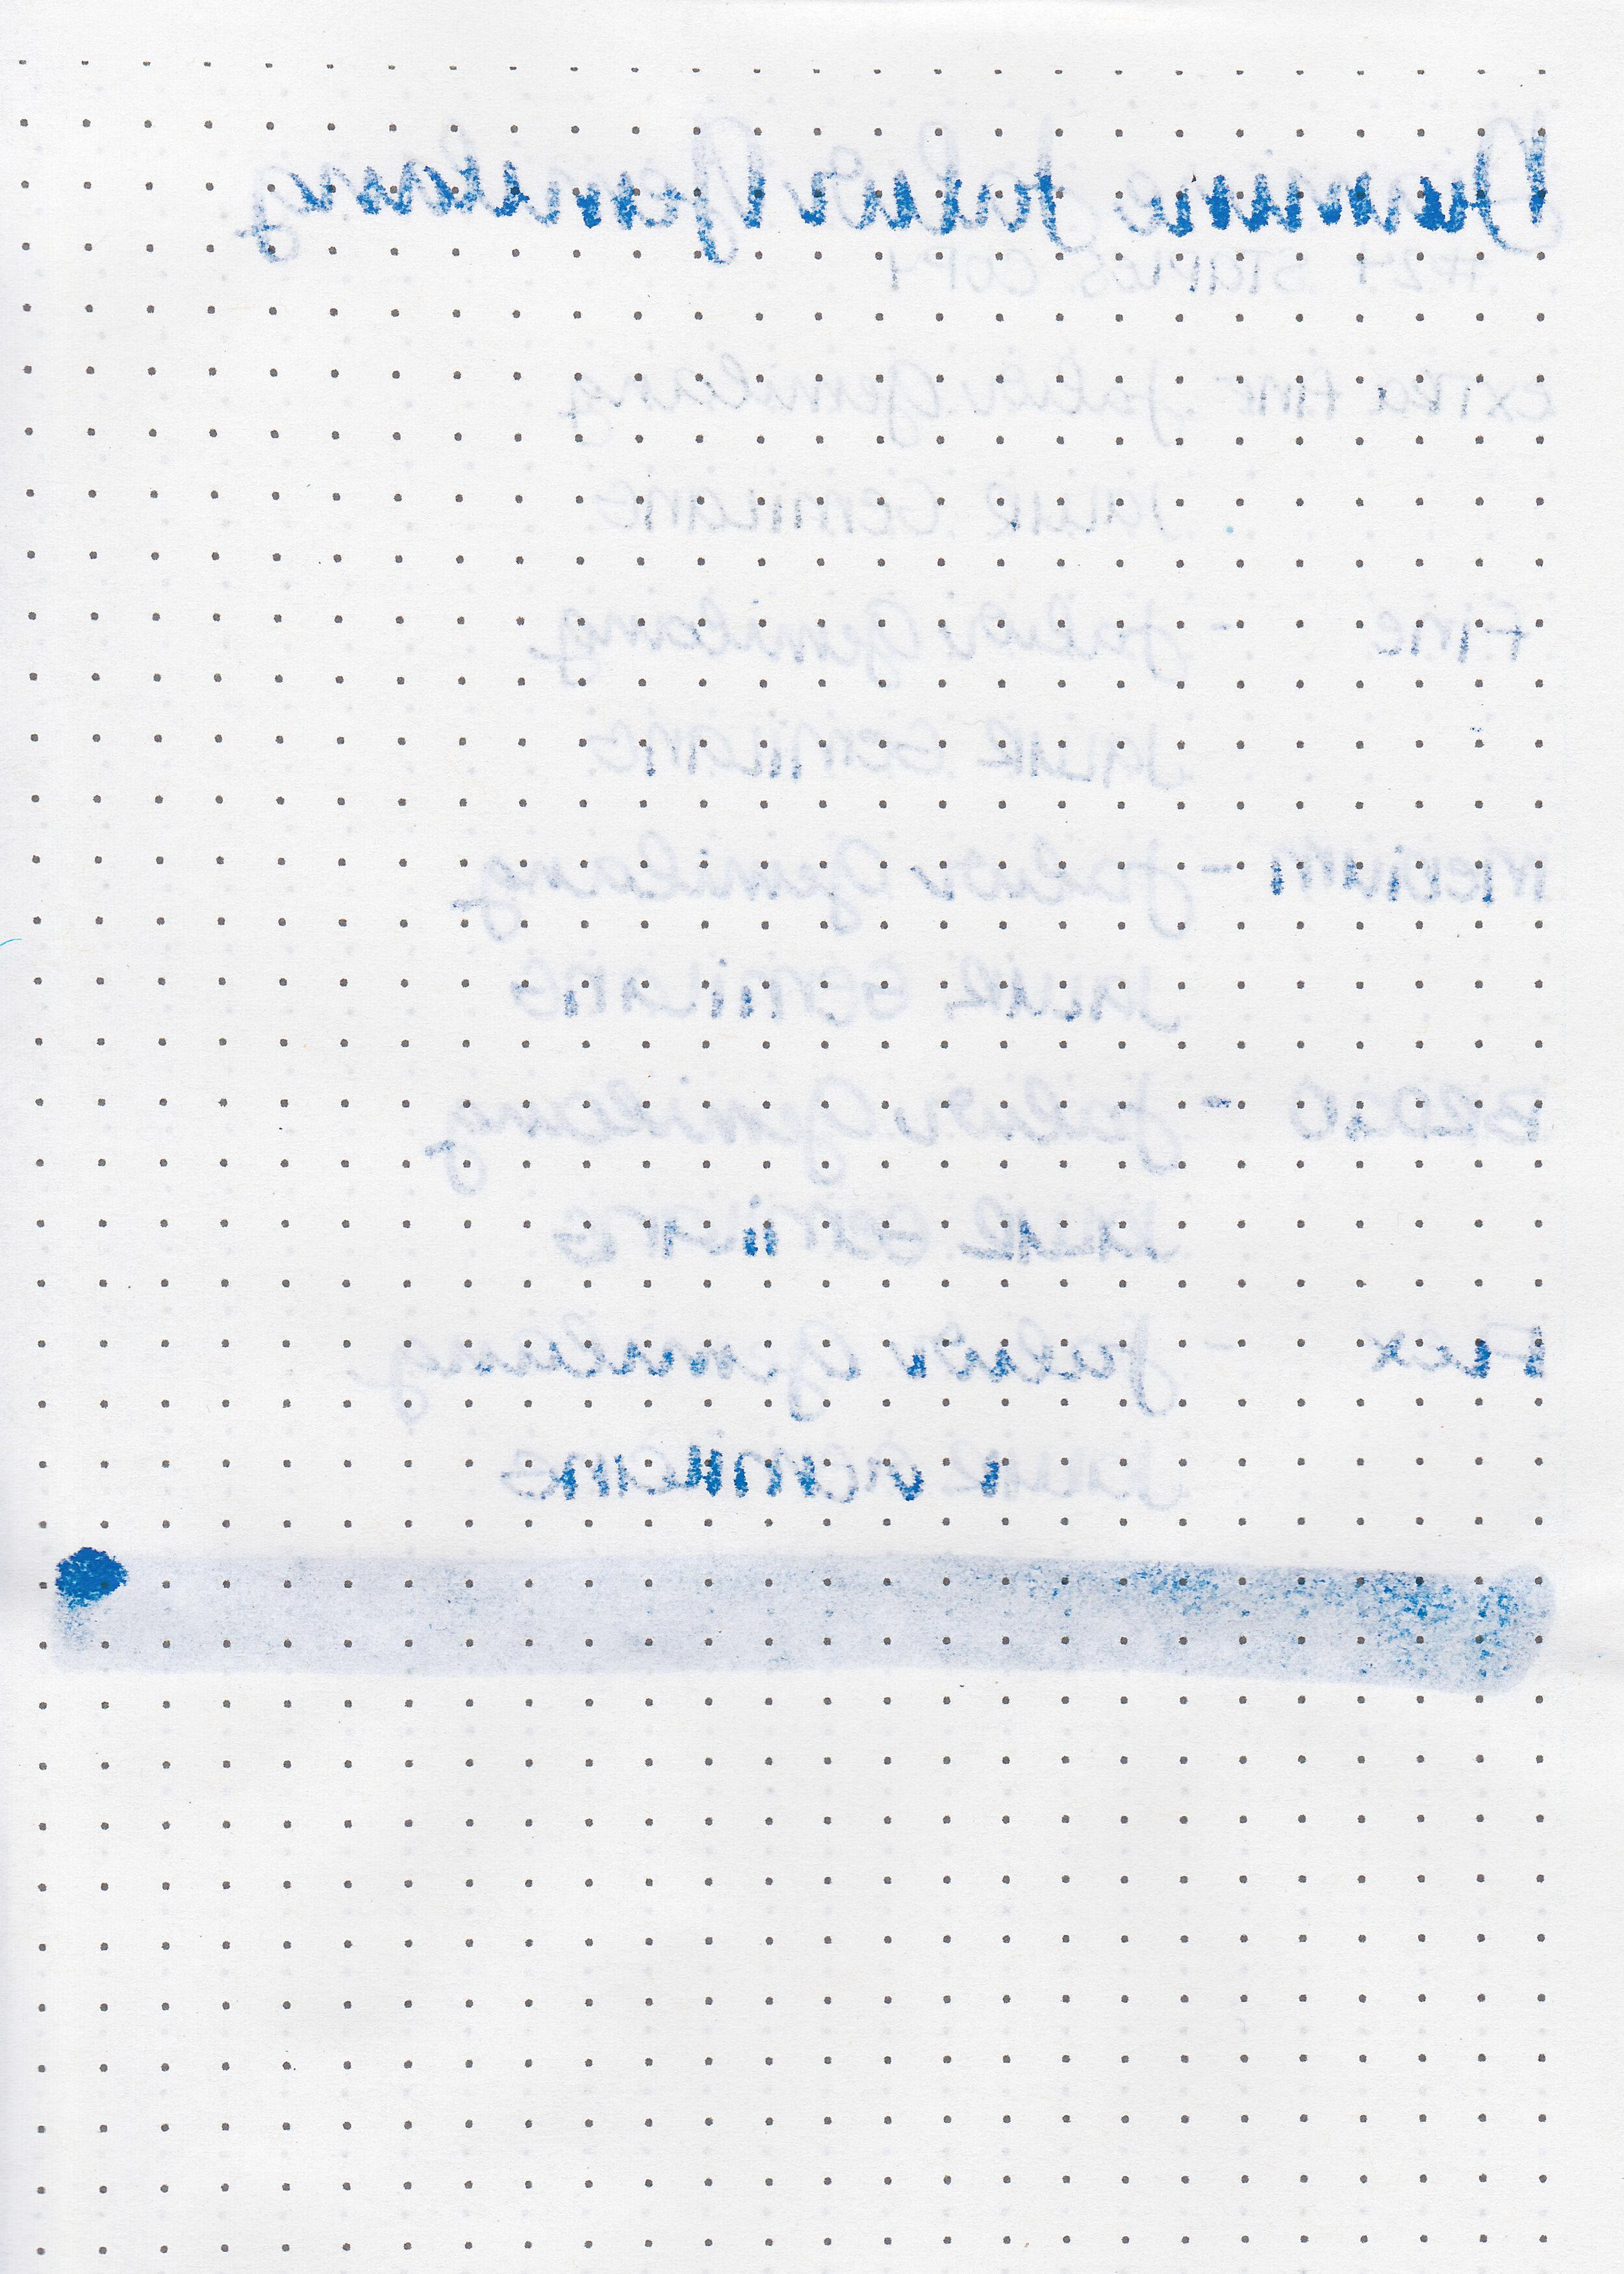 d-jalur-gemilang-13.jpg